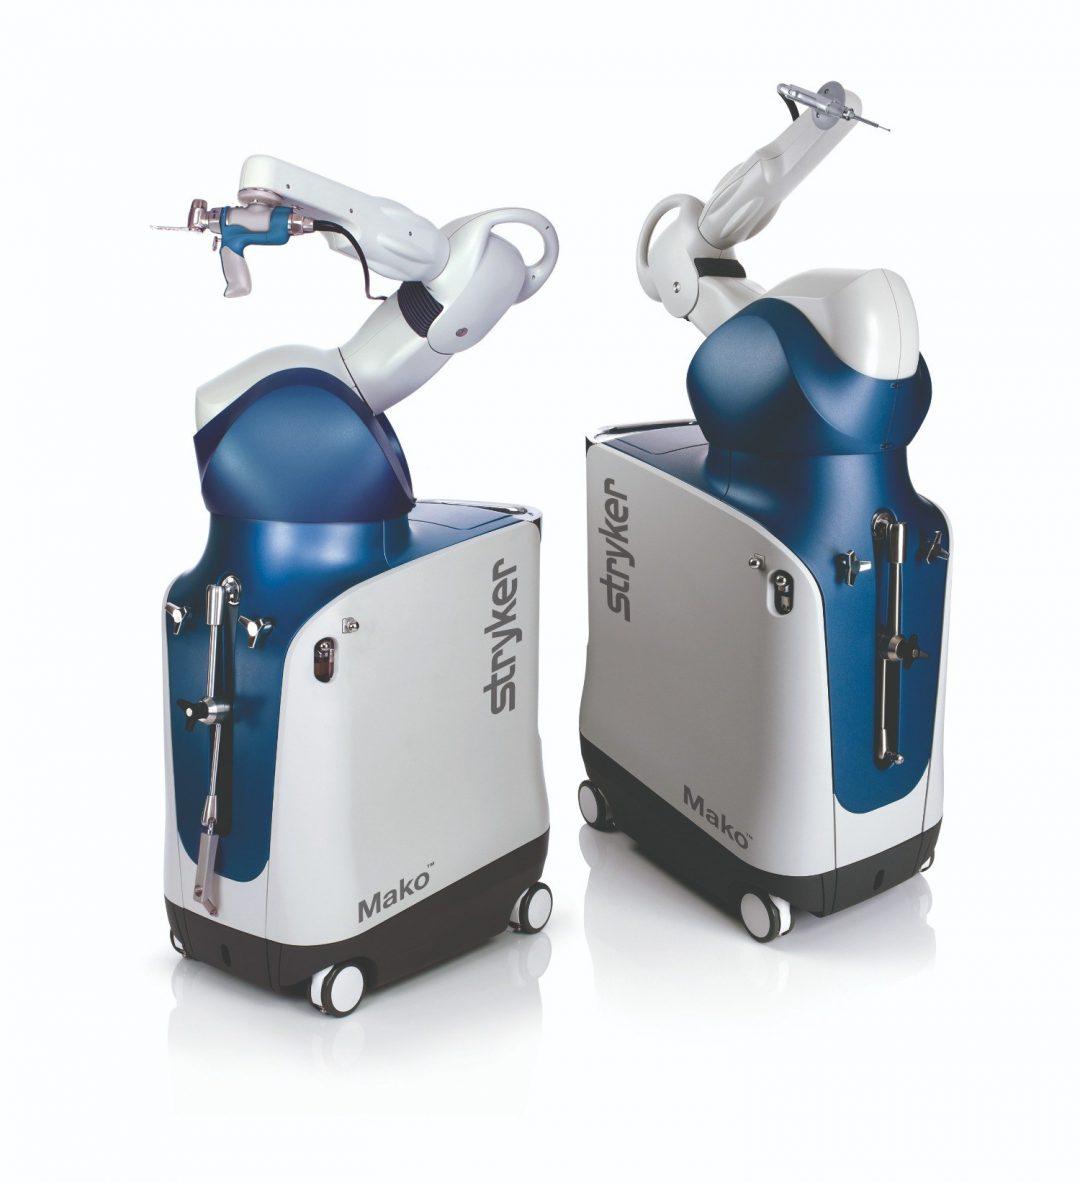 Mako-Robot - 2